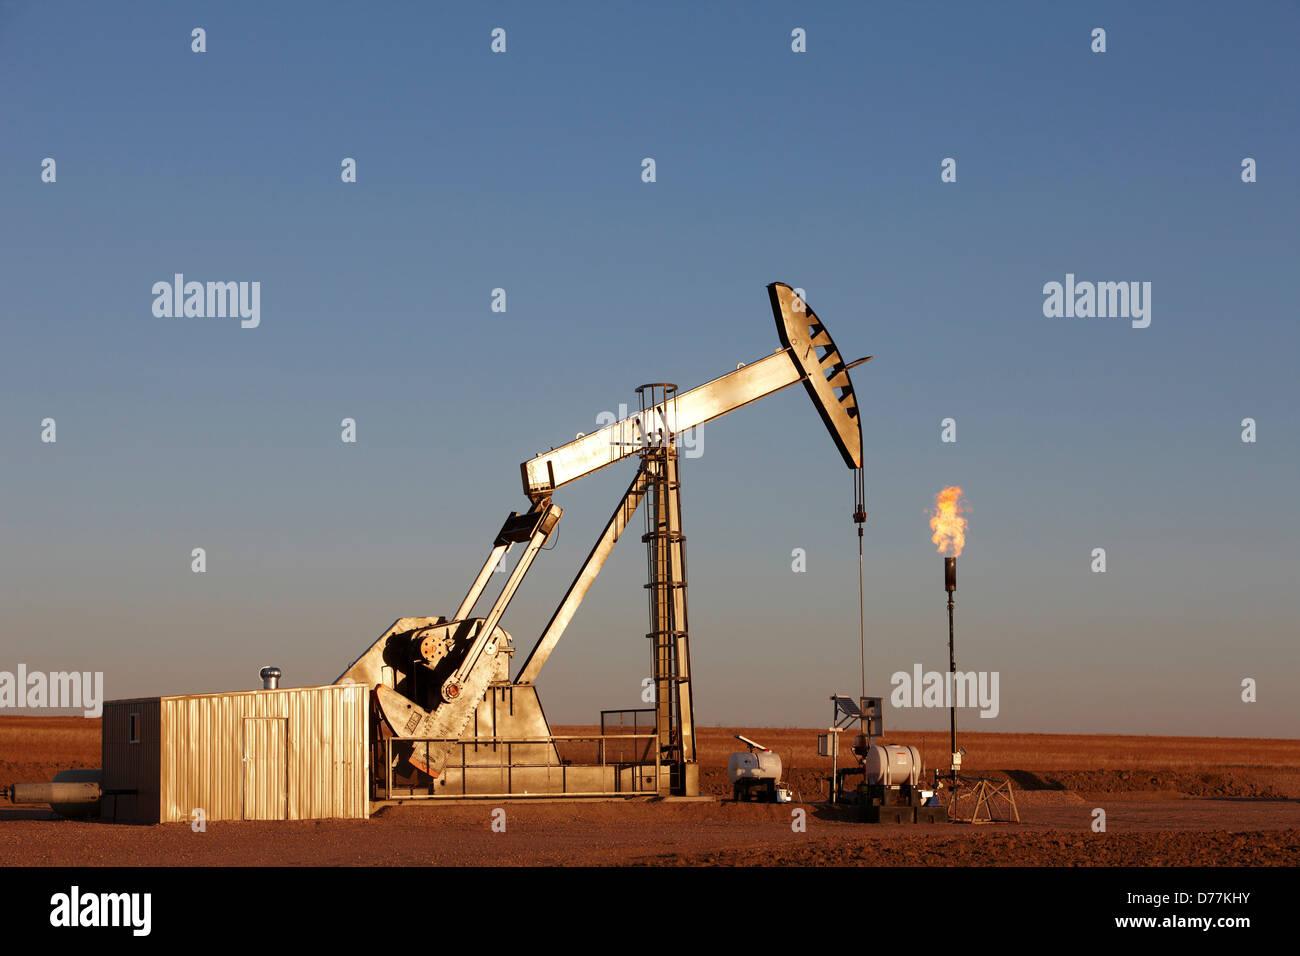 Oil well pumpjack pump jack gas flare flare stack eastern